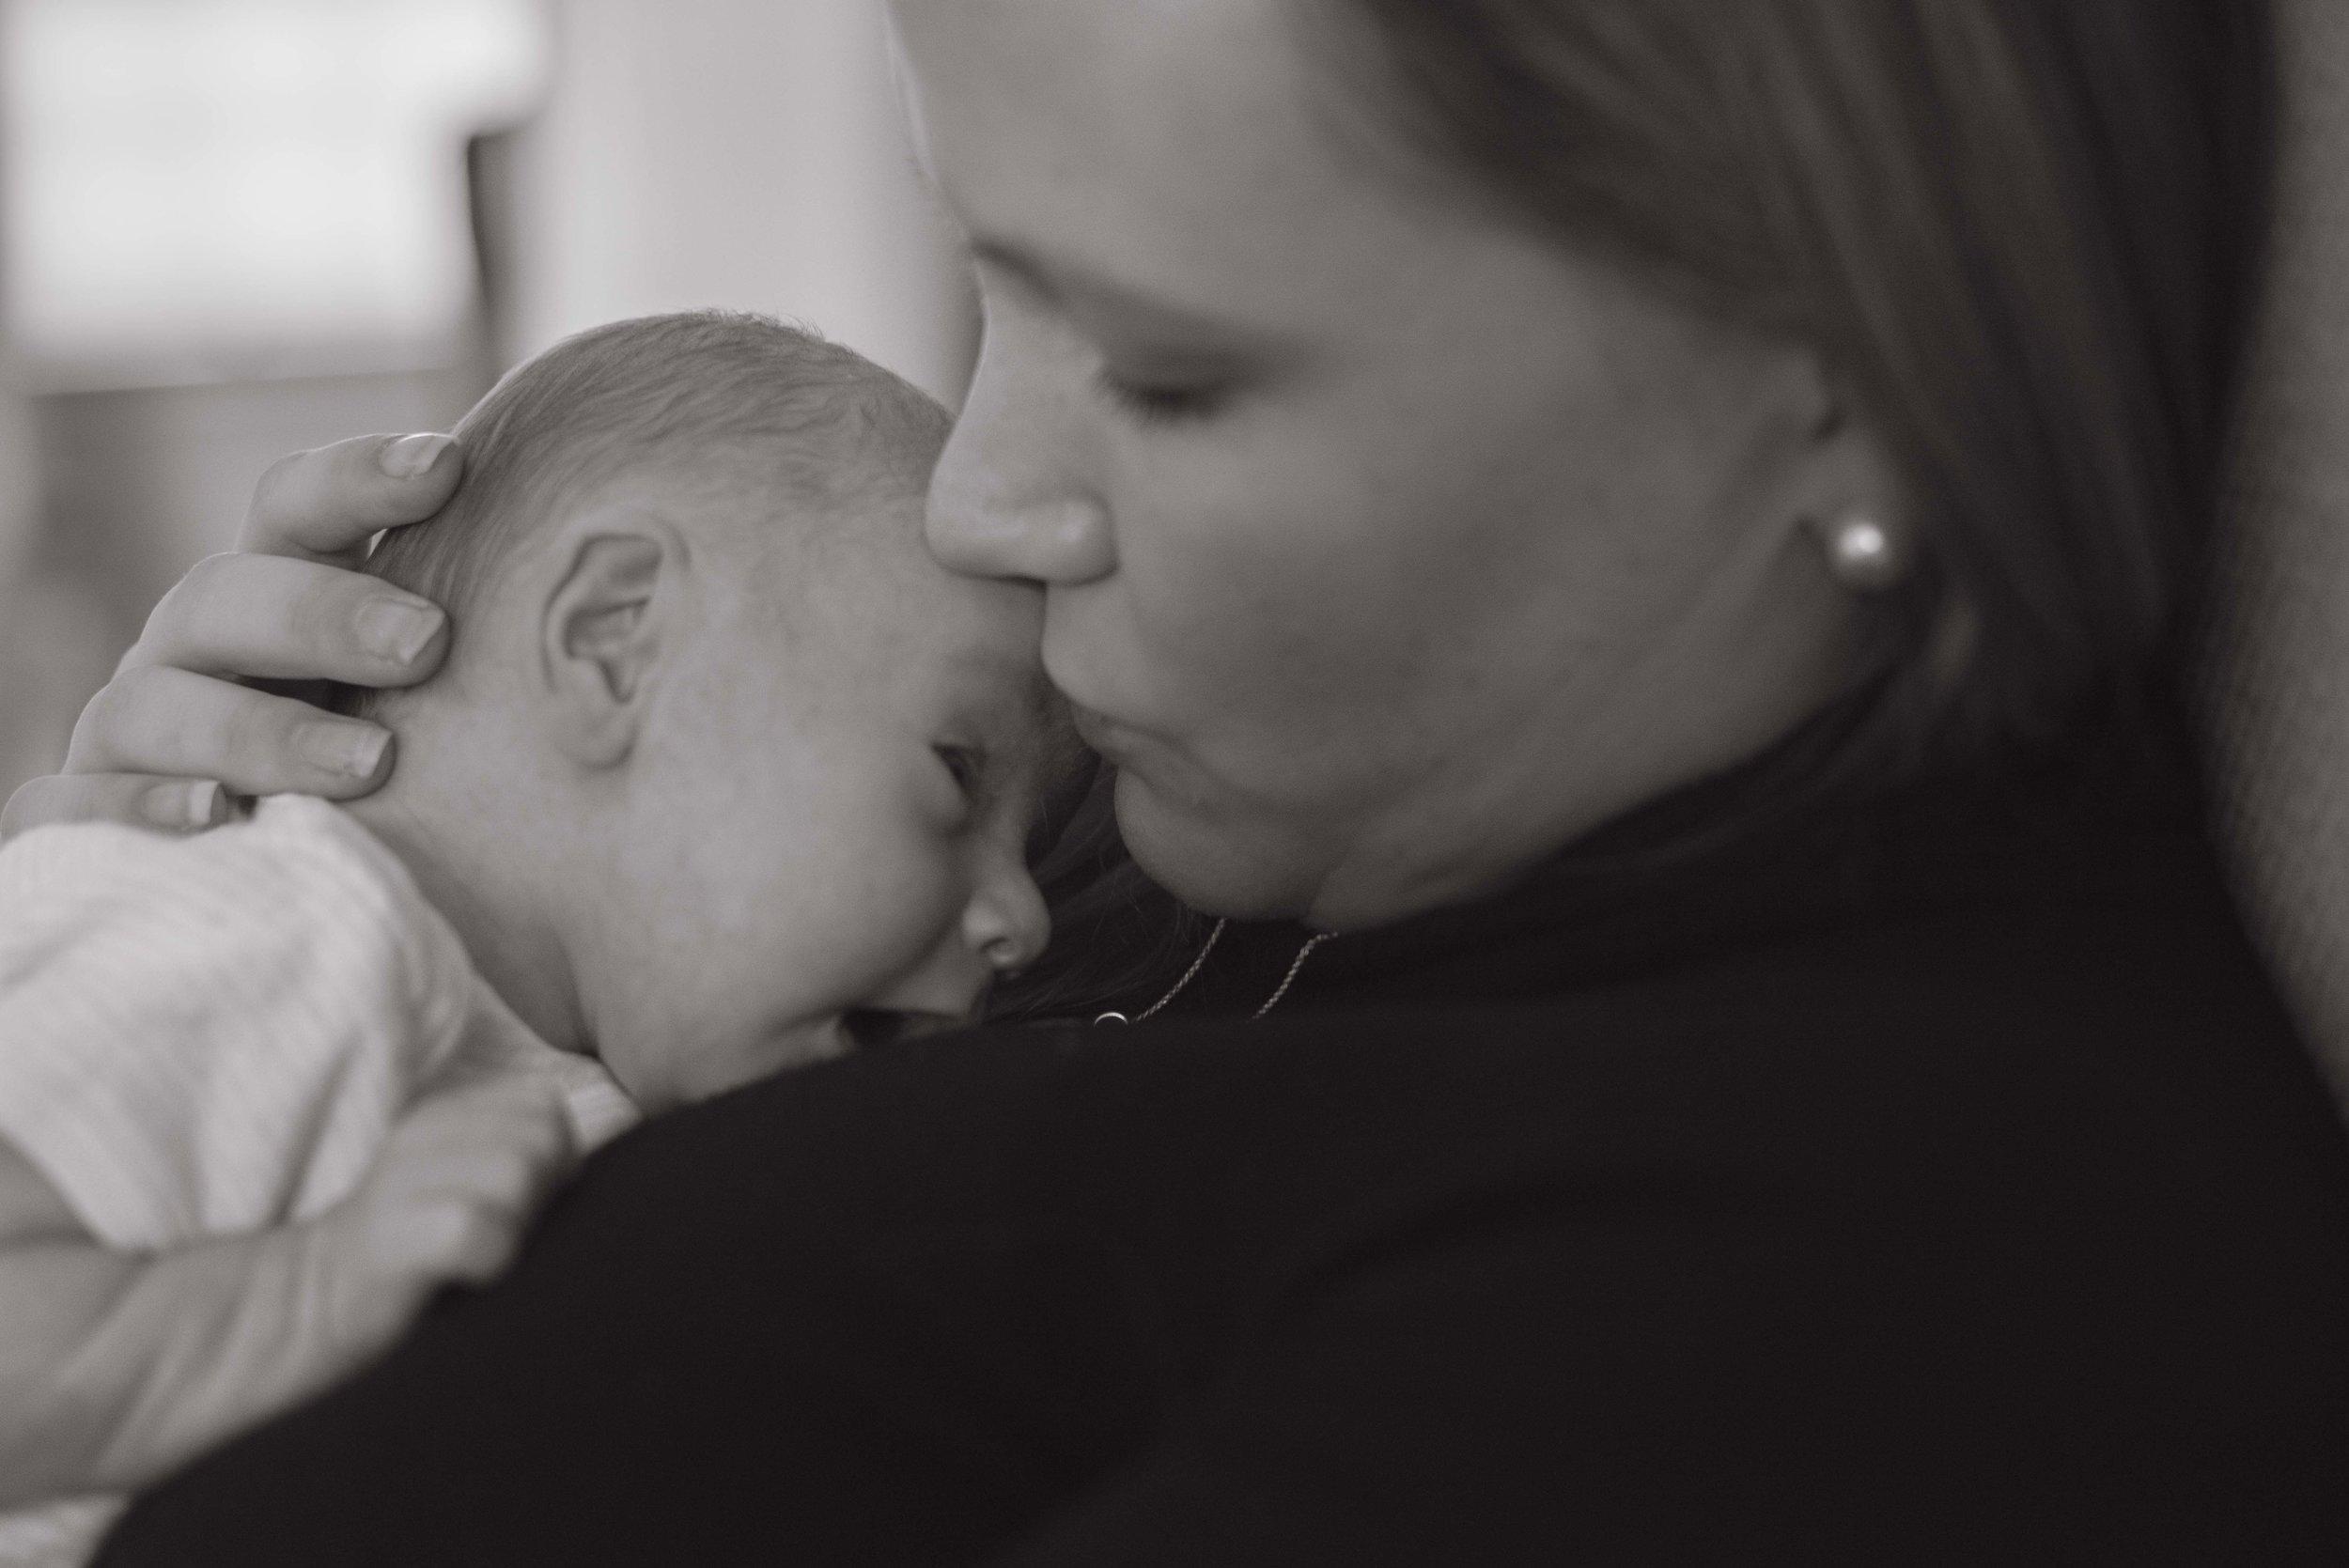 Erin-Kirkpatrick-Fabio-Photography-2018-APF-Baby-Photos-Jan19-34.jpg